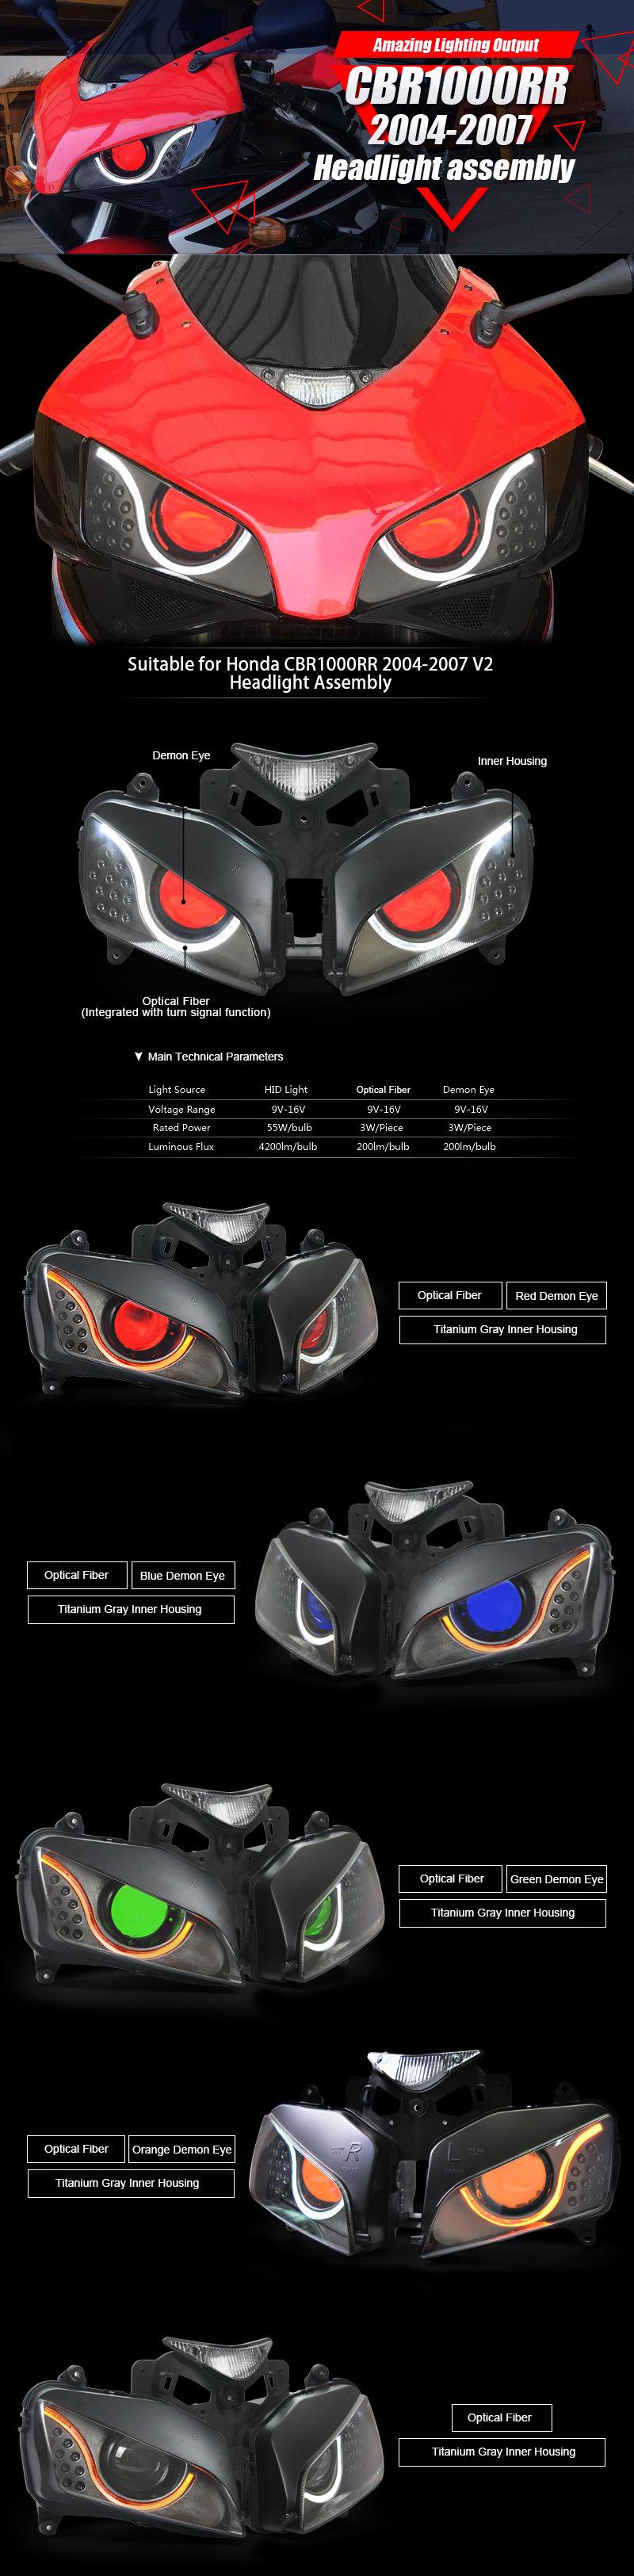 CBR1000RR LED Headlight 2004 2005 2006 2007